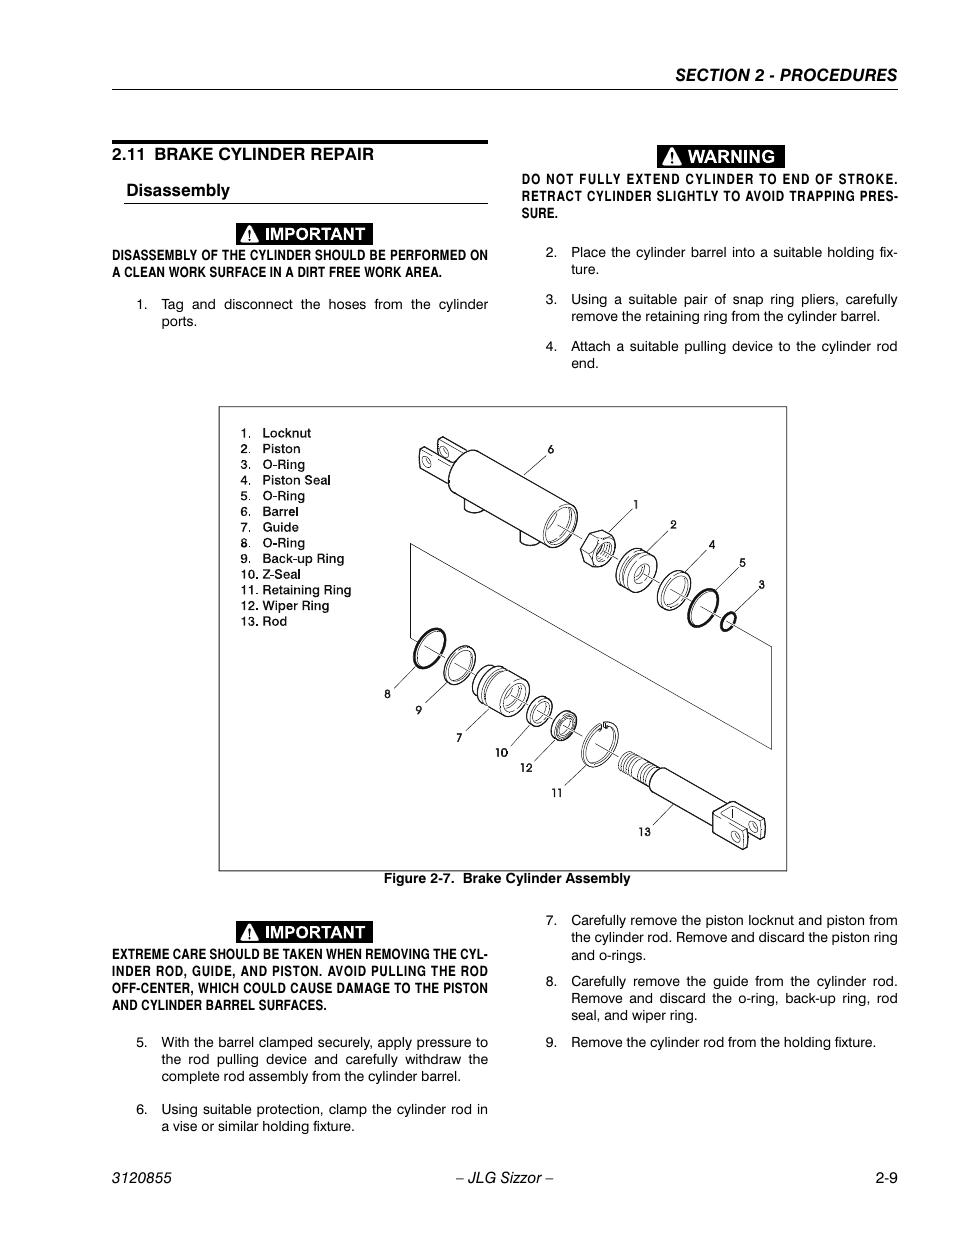 11 Brake Cylinder Repair  Disassembly  Brake Cylinder